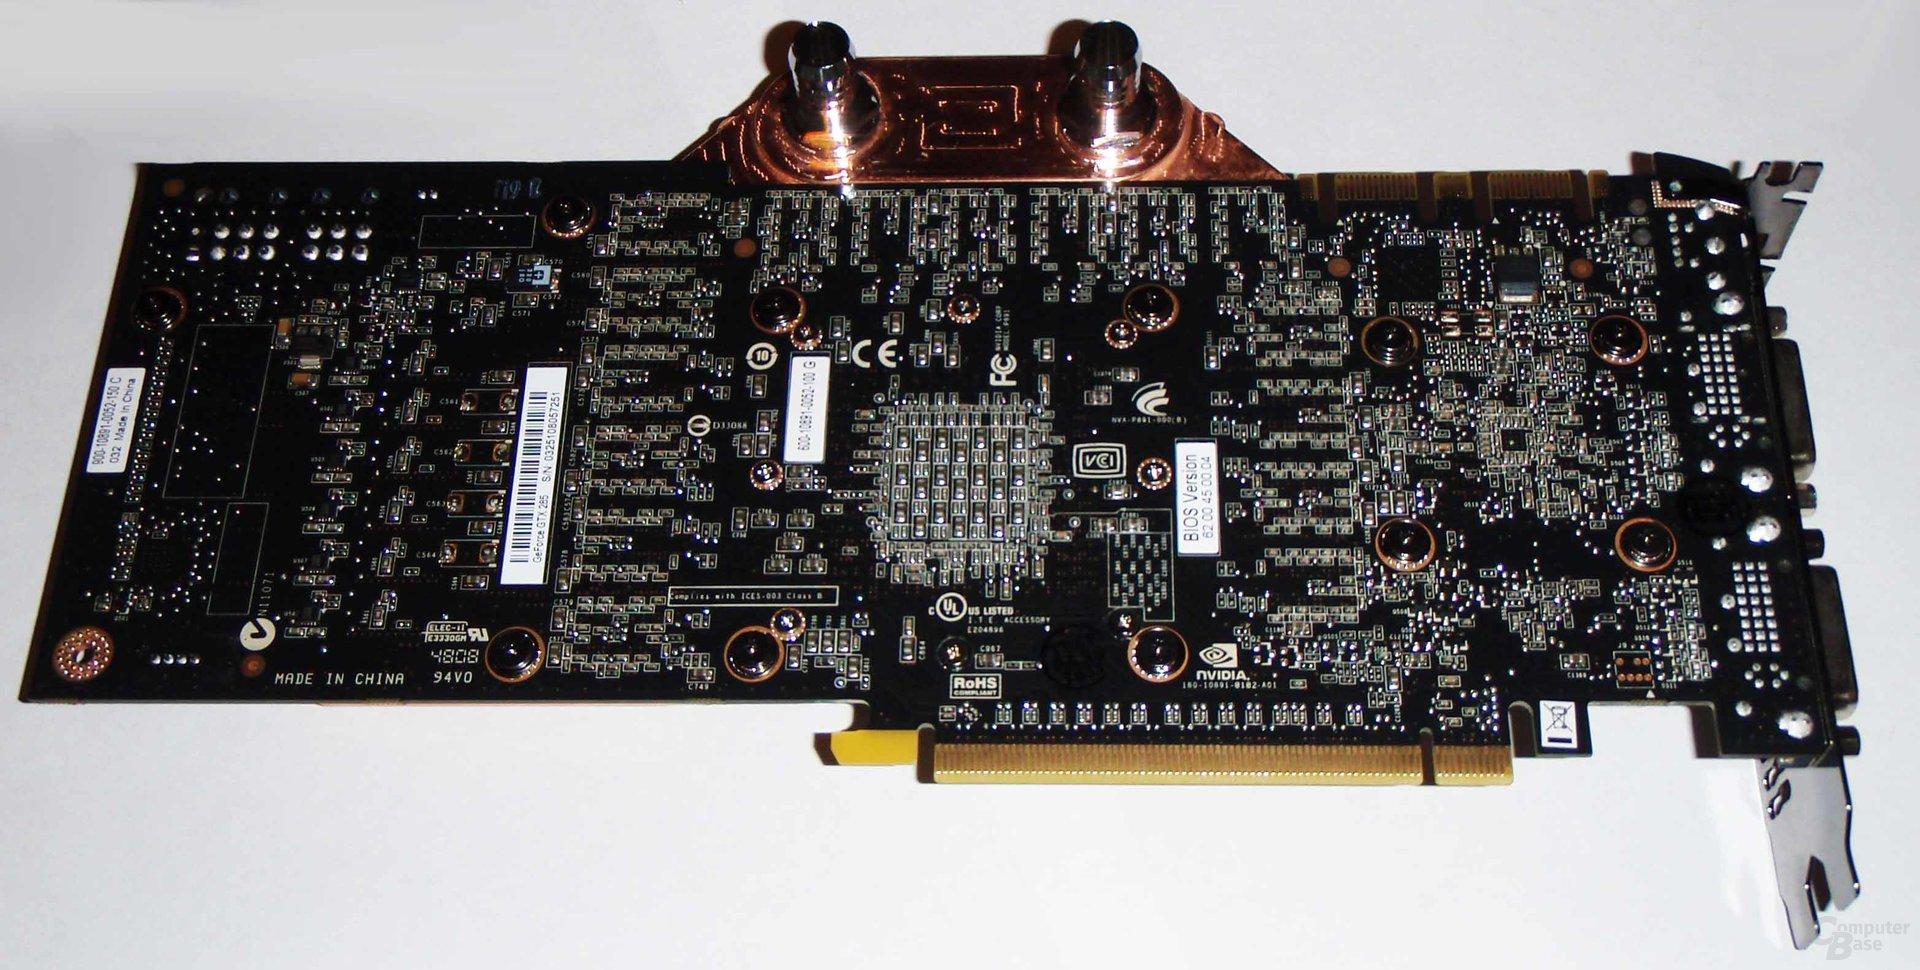 Zotac GeForce GTX 285 Infinity Edition